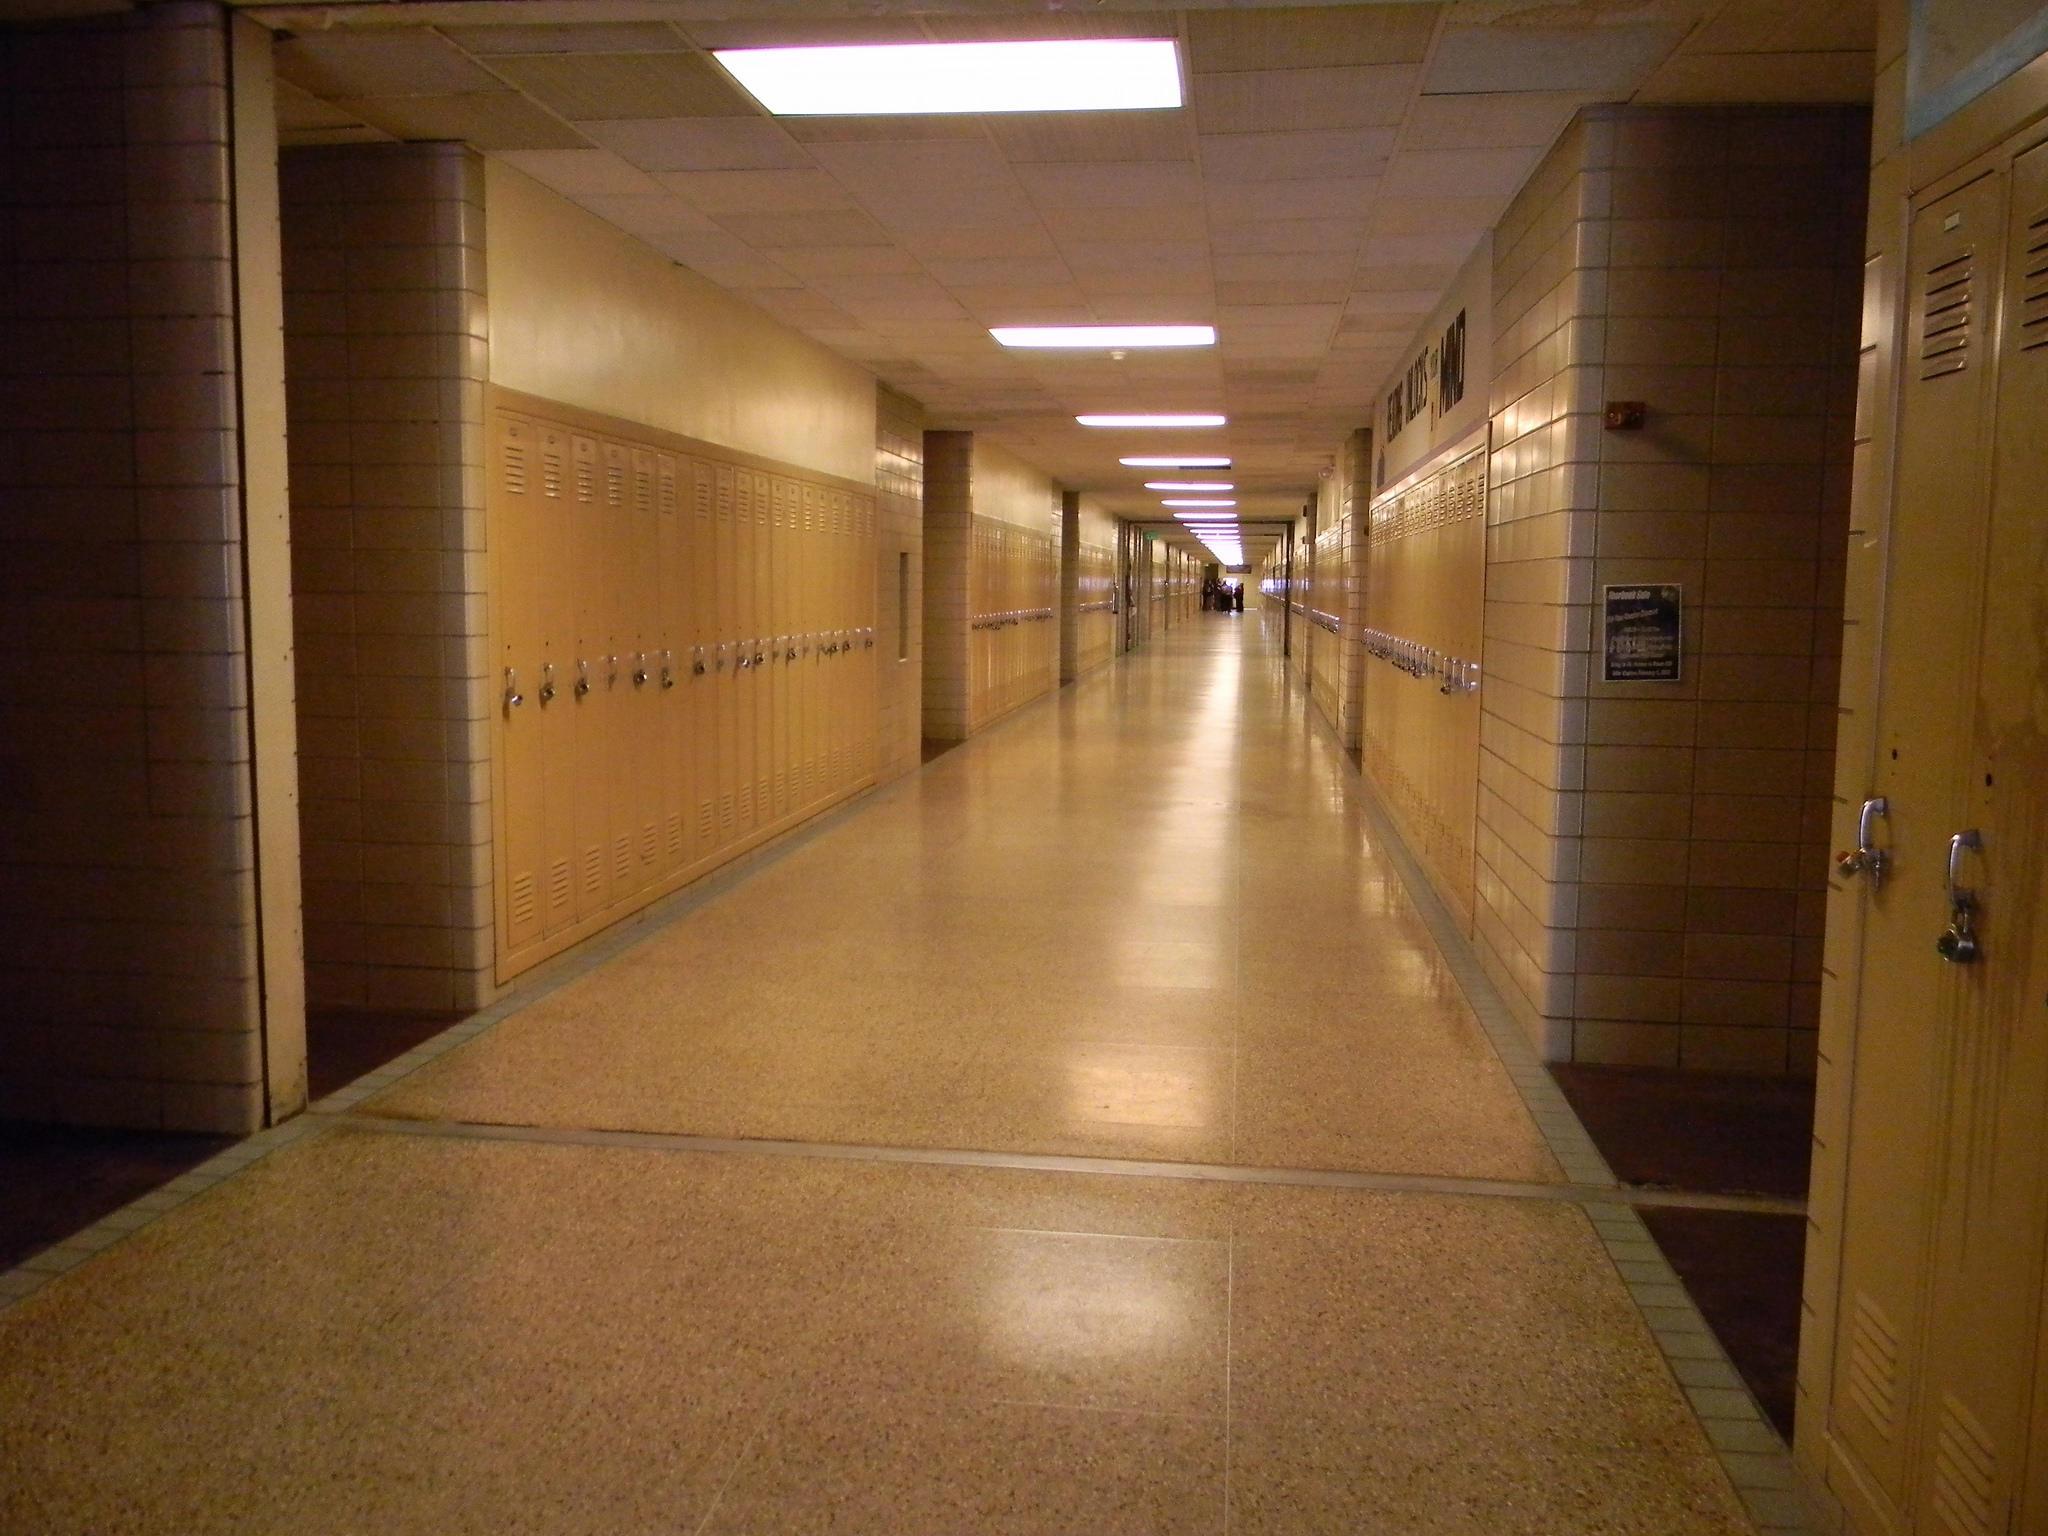 school choice understanding criteria high schools and the process credit flickr creative commons david robert crews